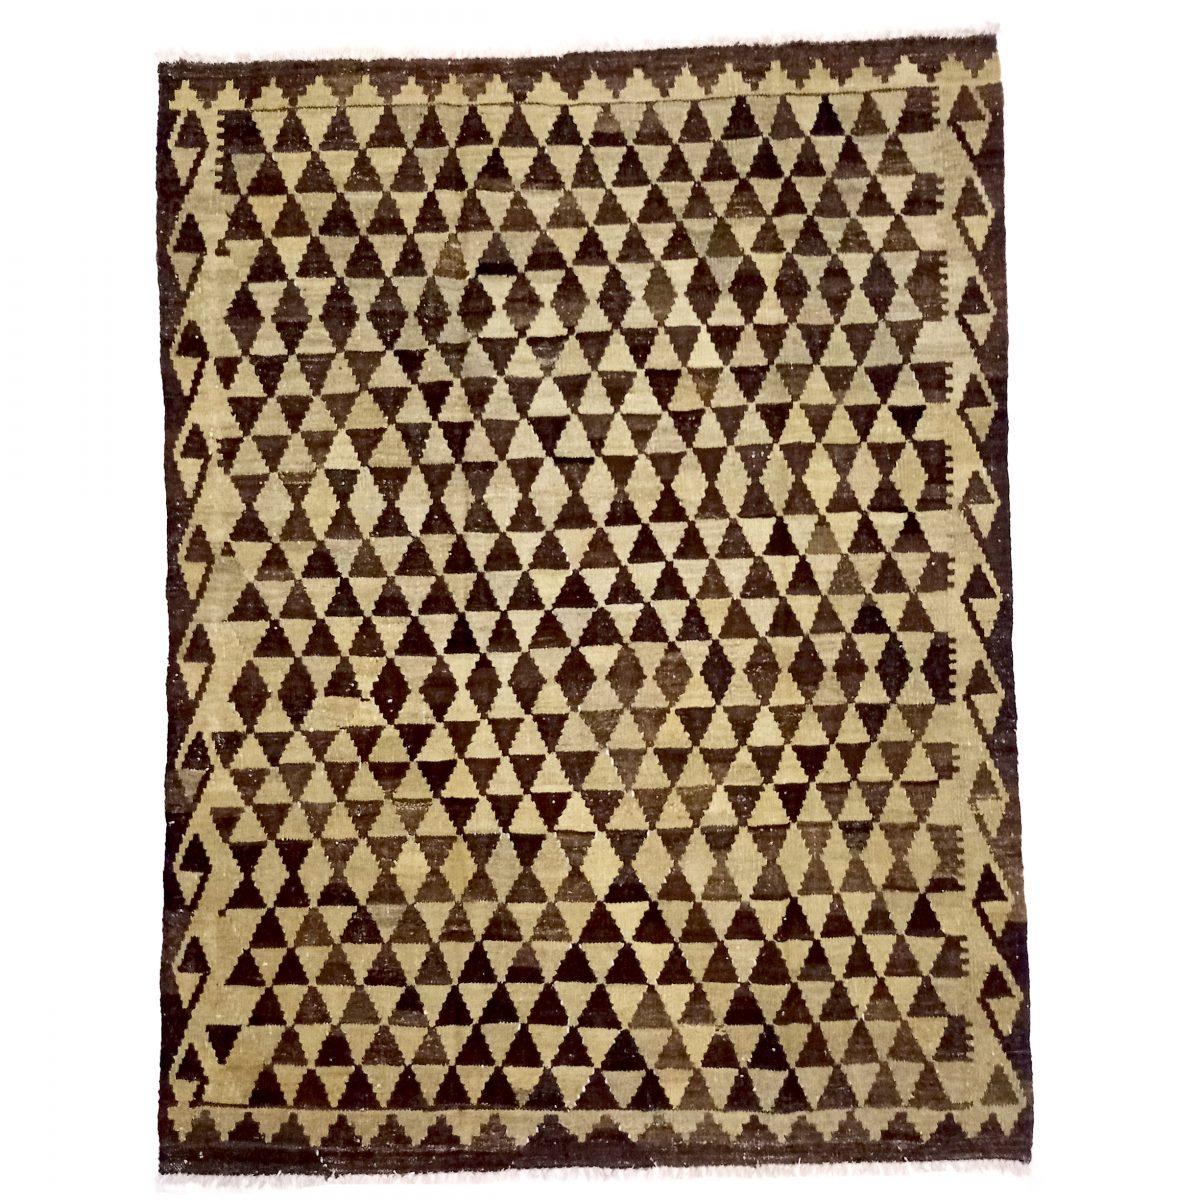 triangular pattern kilim